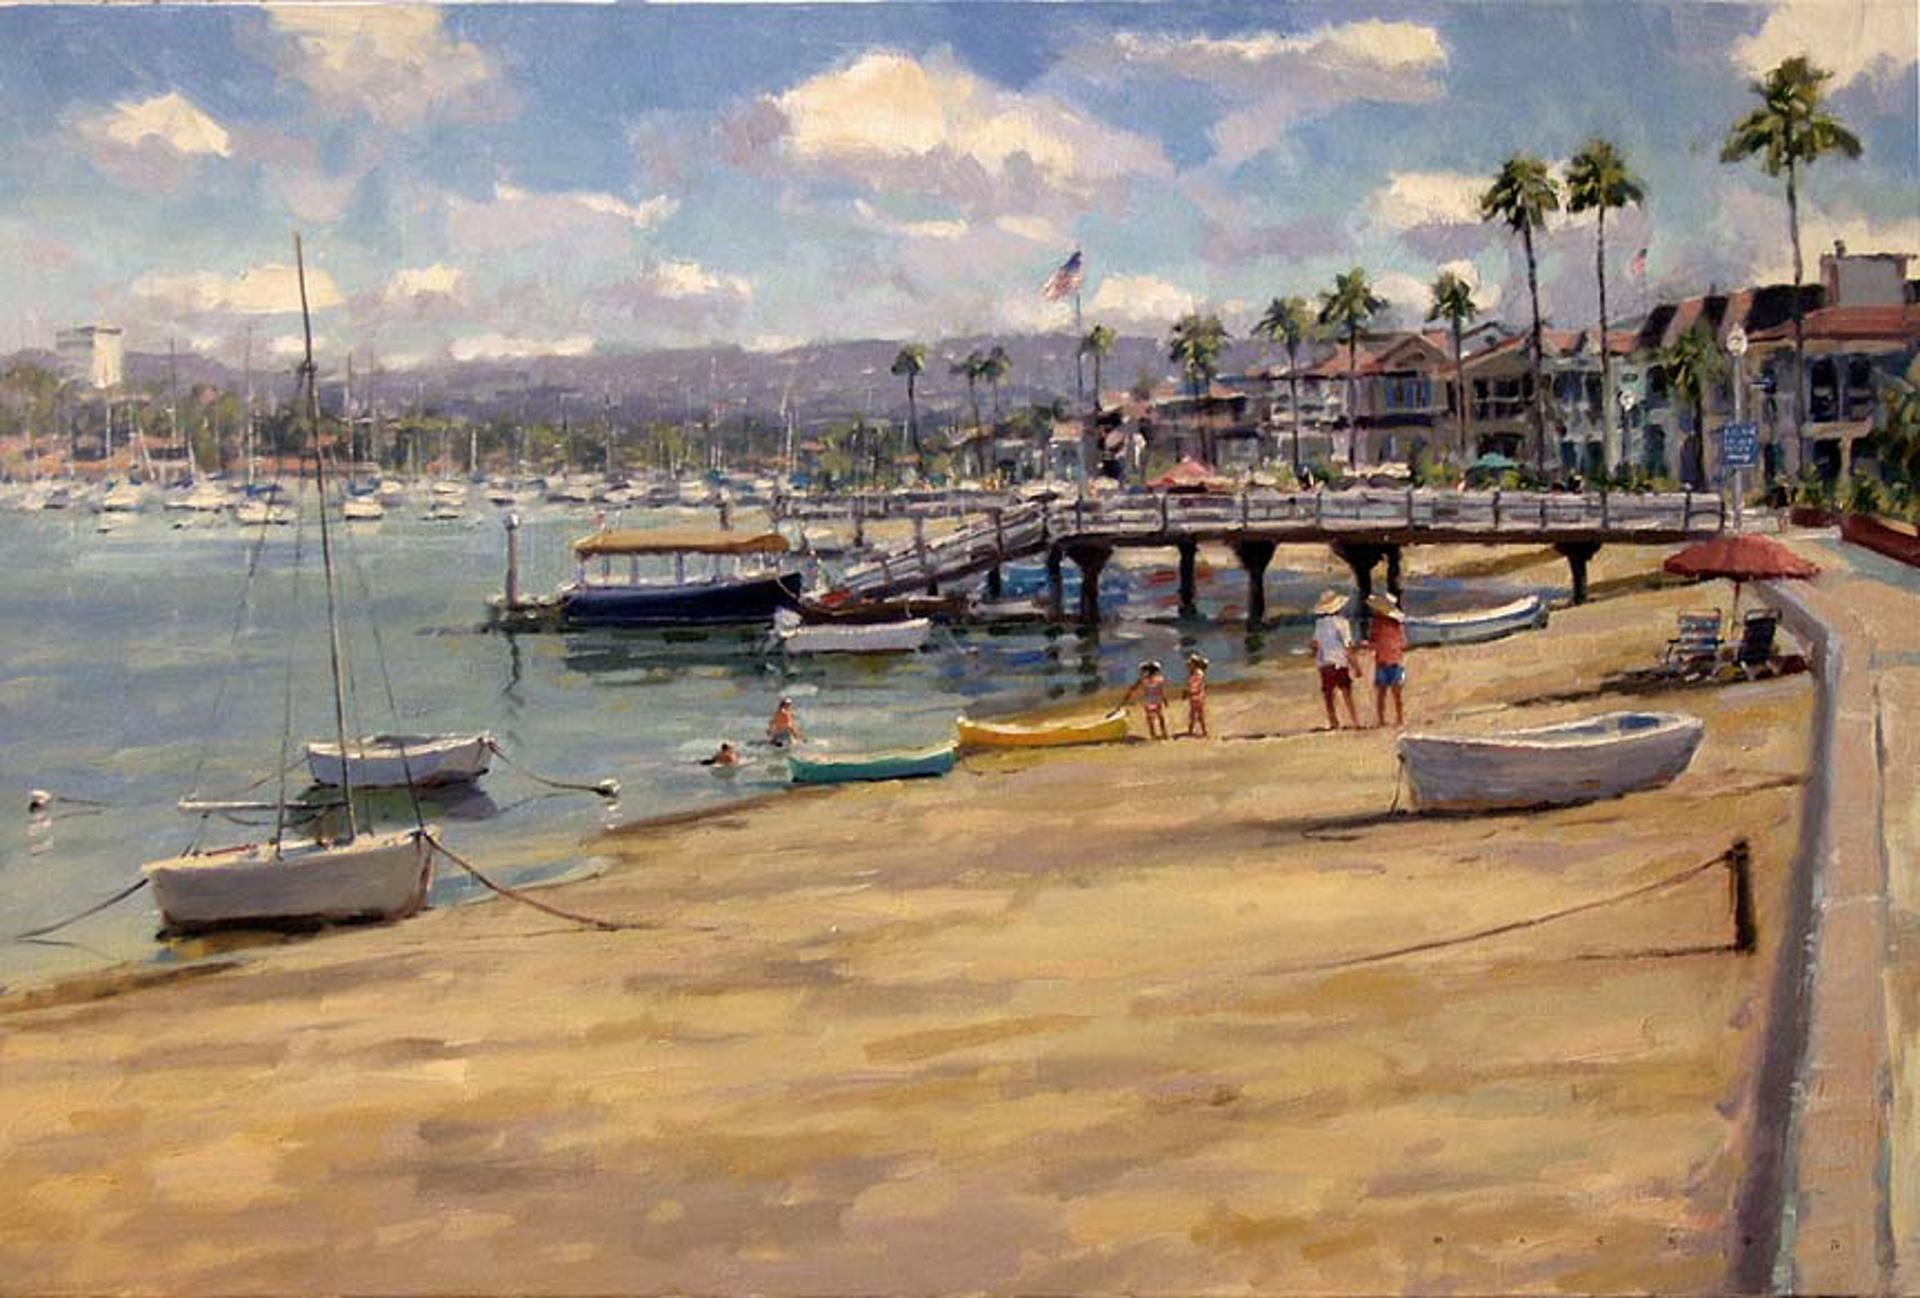 Balboa Island Paradise by Ronaldo Macedo